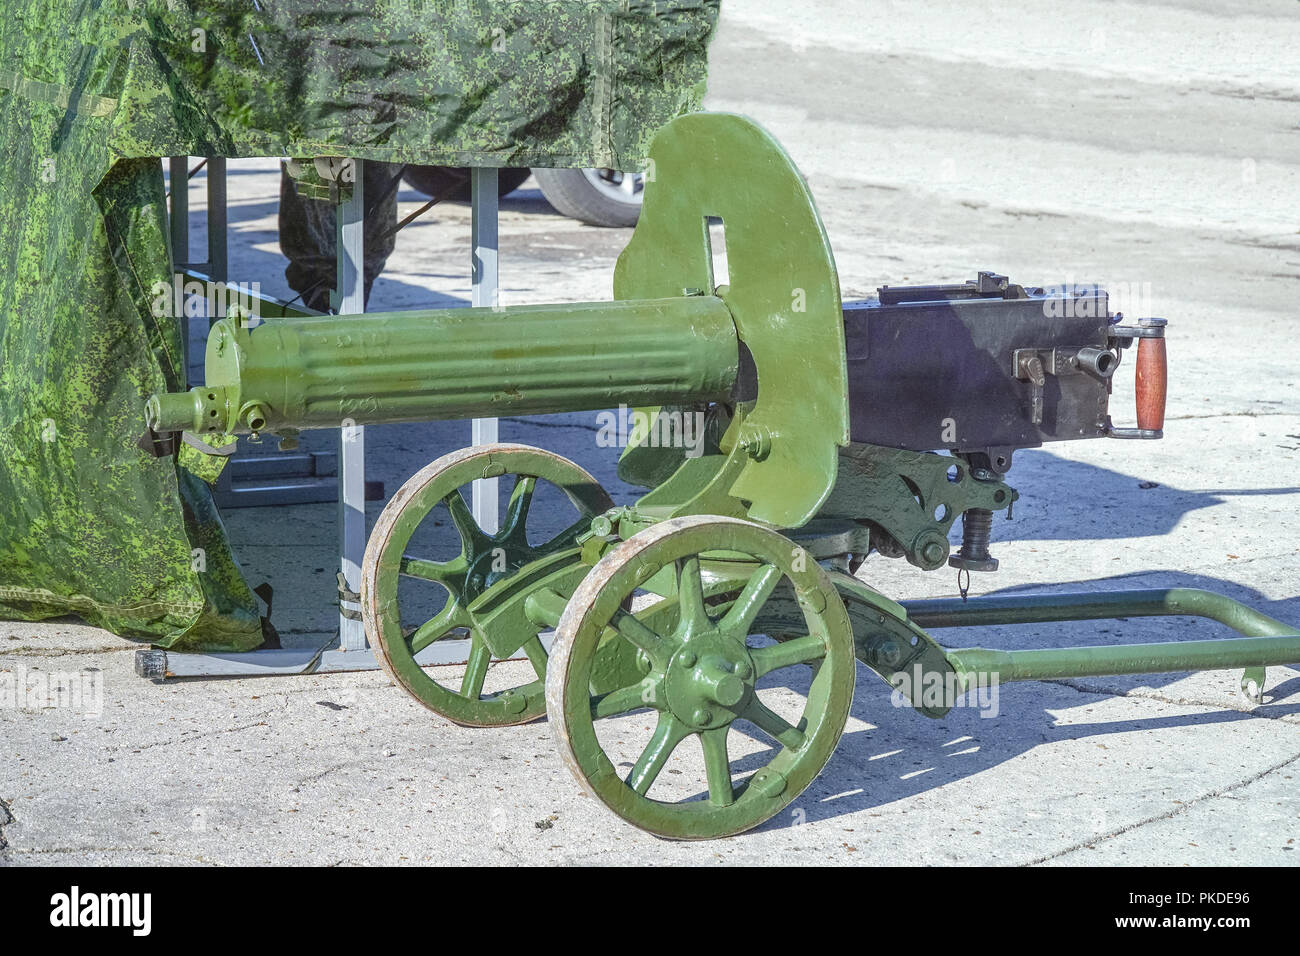 Machine gun green color Maxim system - Stock Image